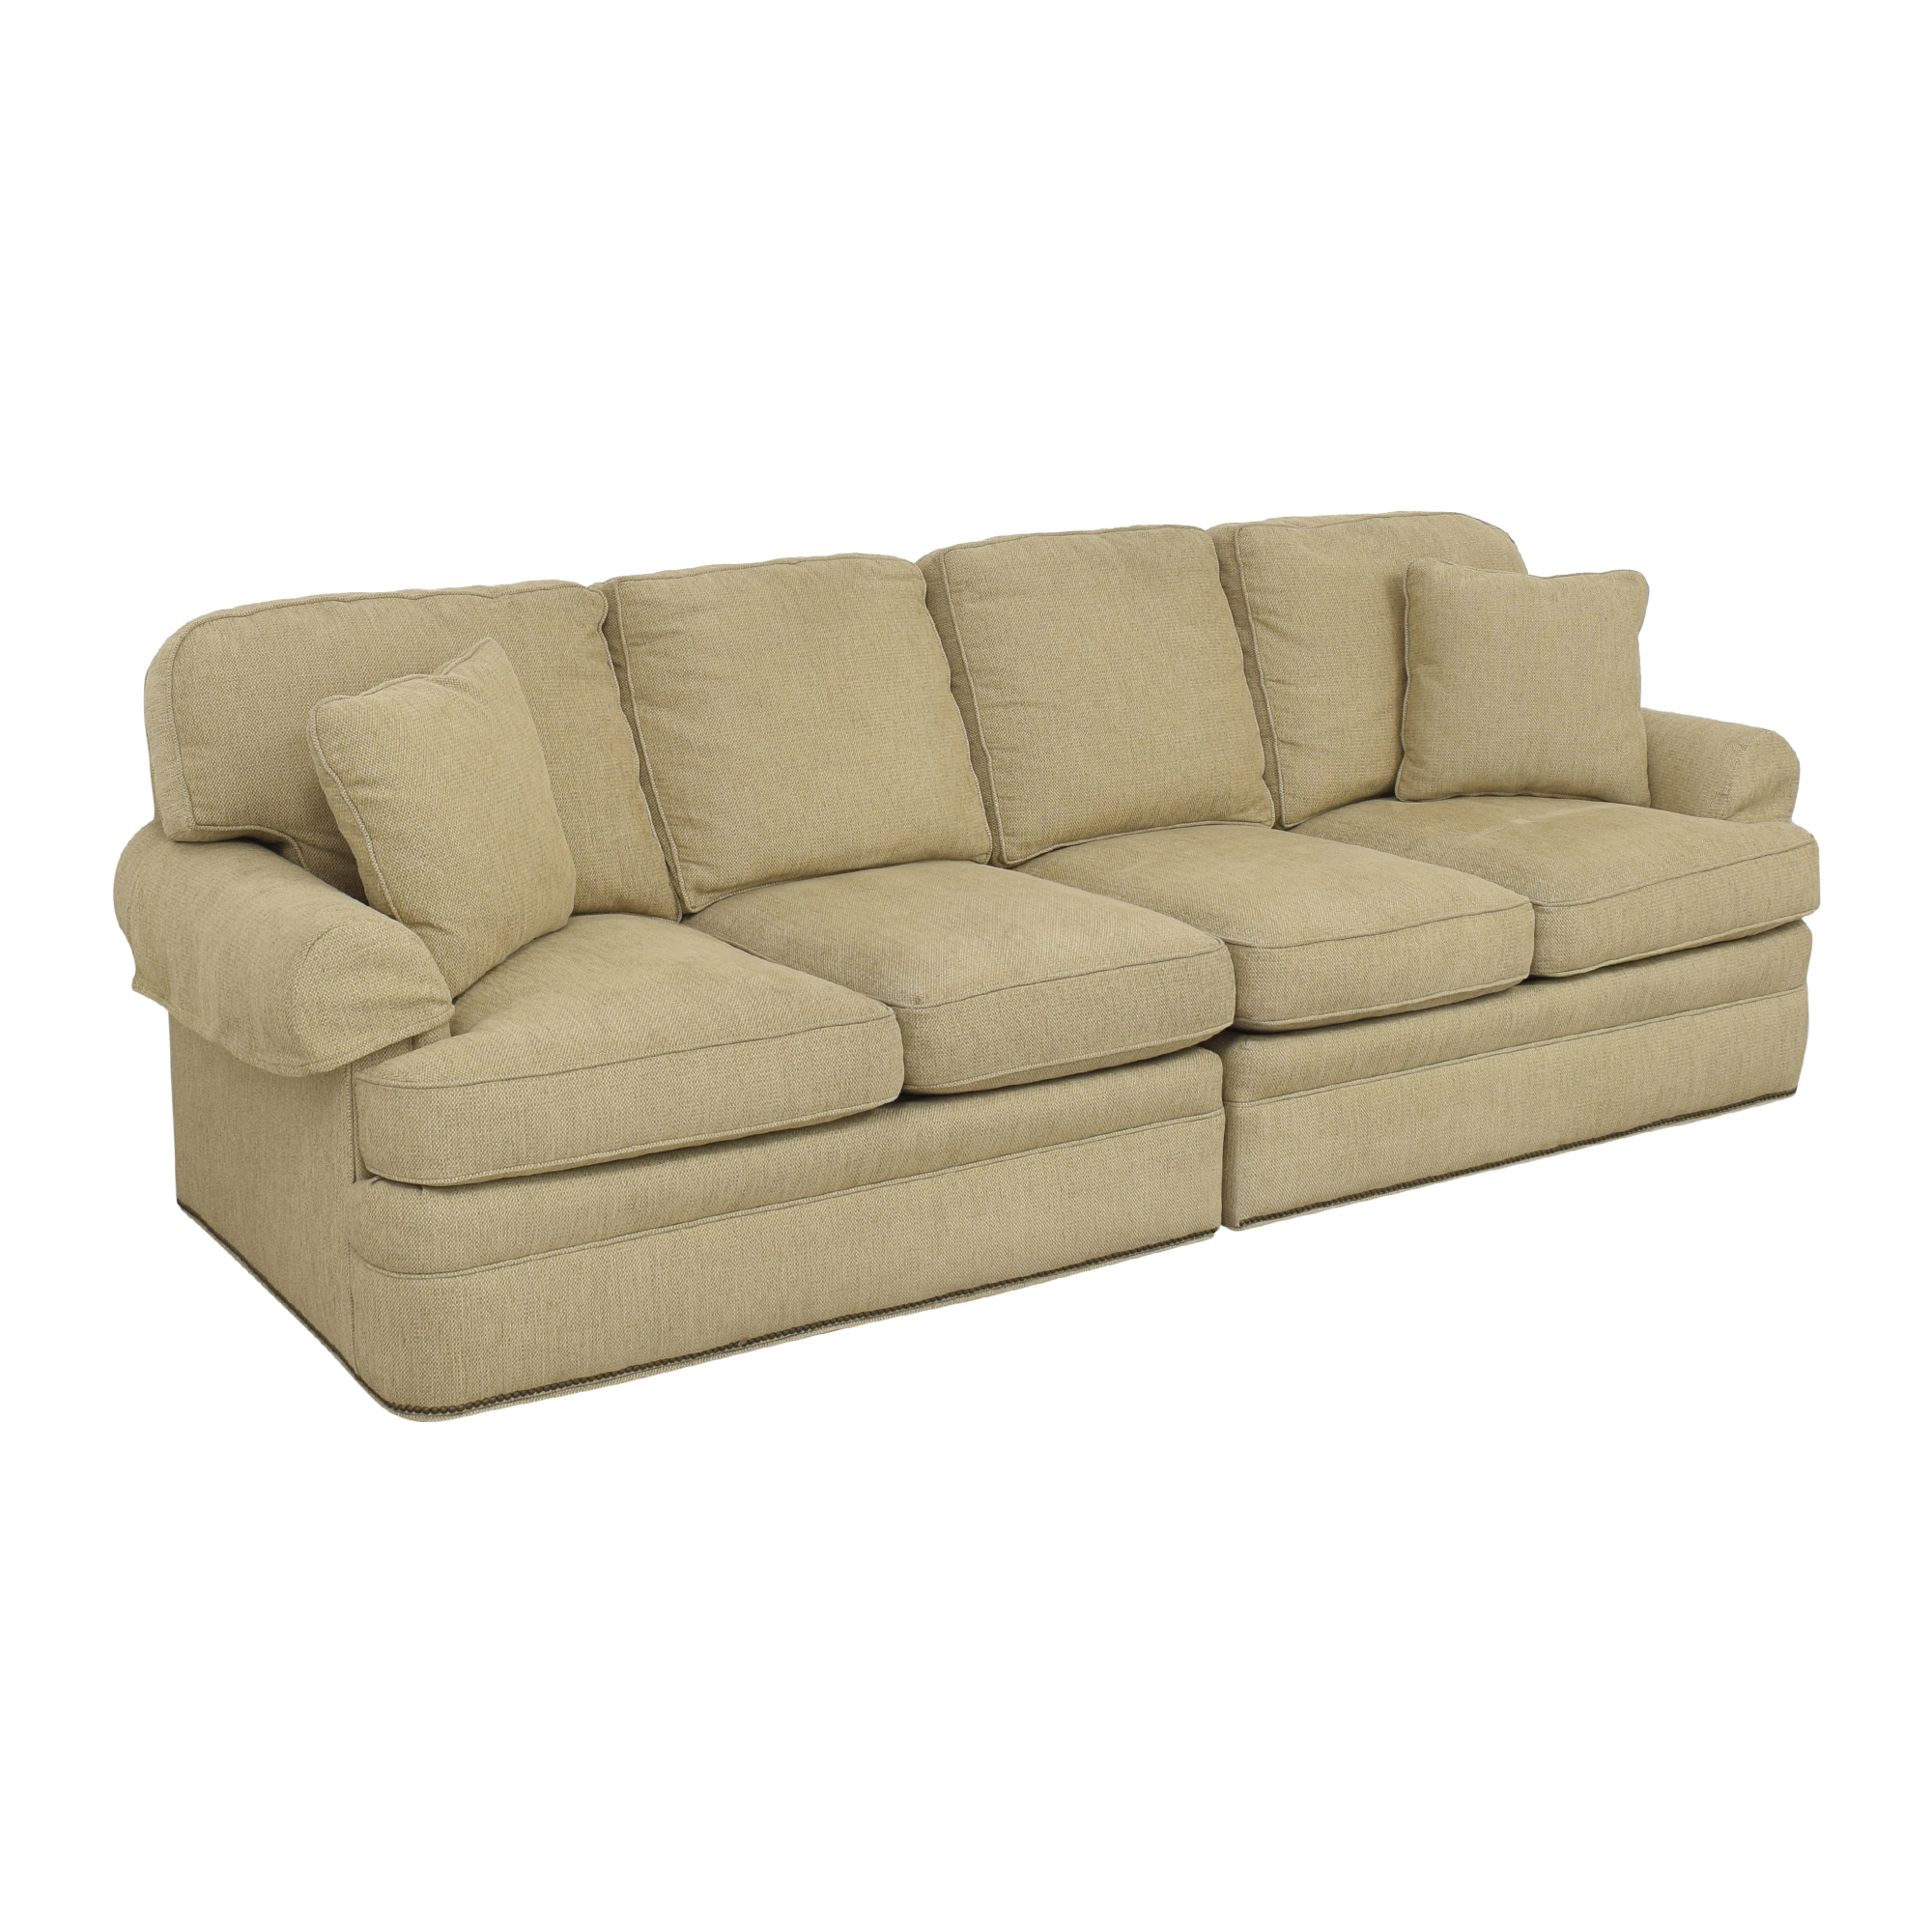 Safavieh Safavieh Two Piece Sectional Sofa